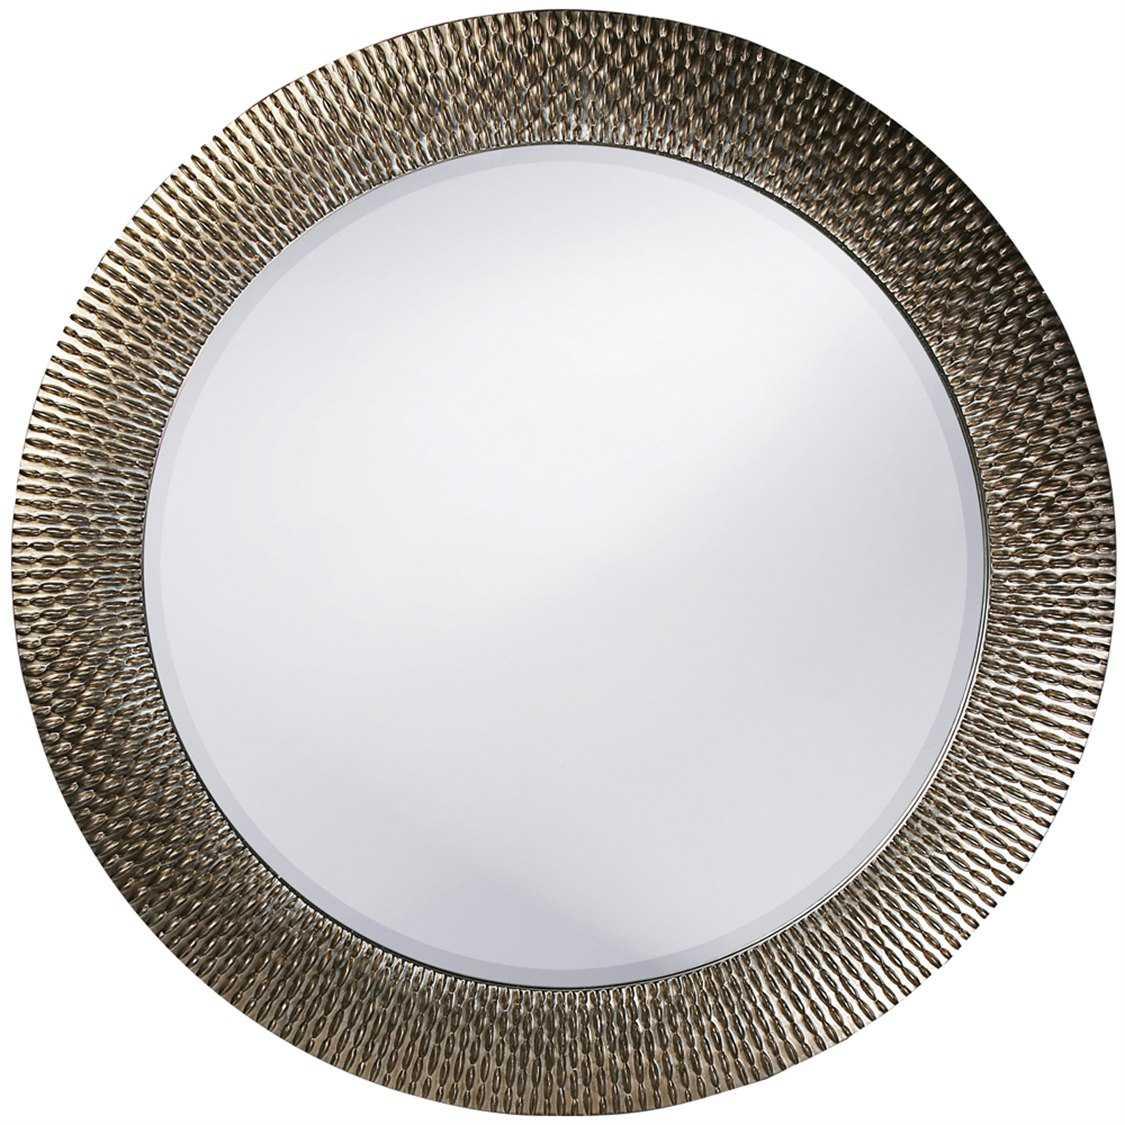 Howard elliott bergman 54 round silver wall mirror 21117 for Round silver wall mirror